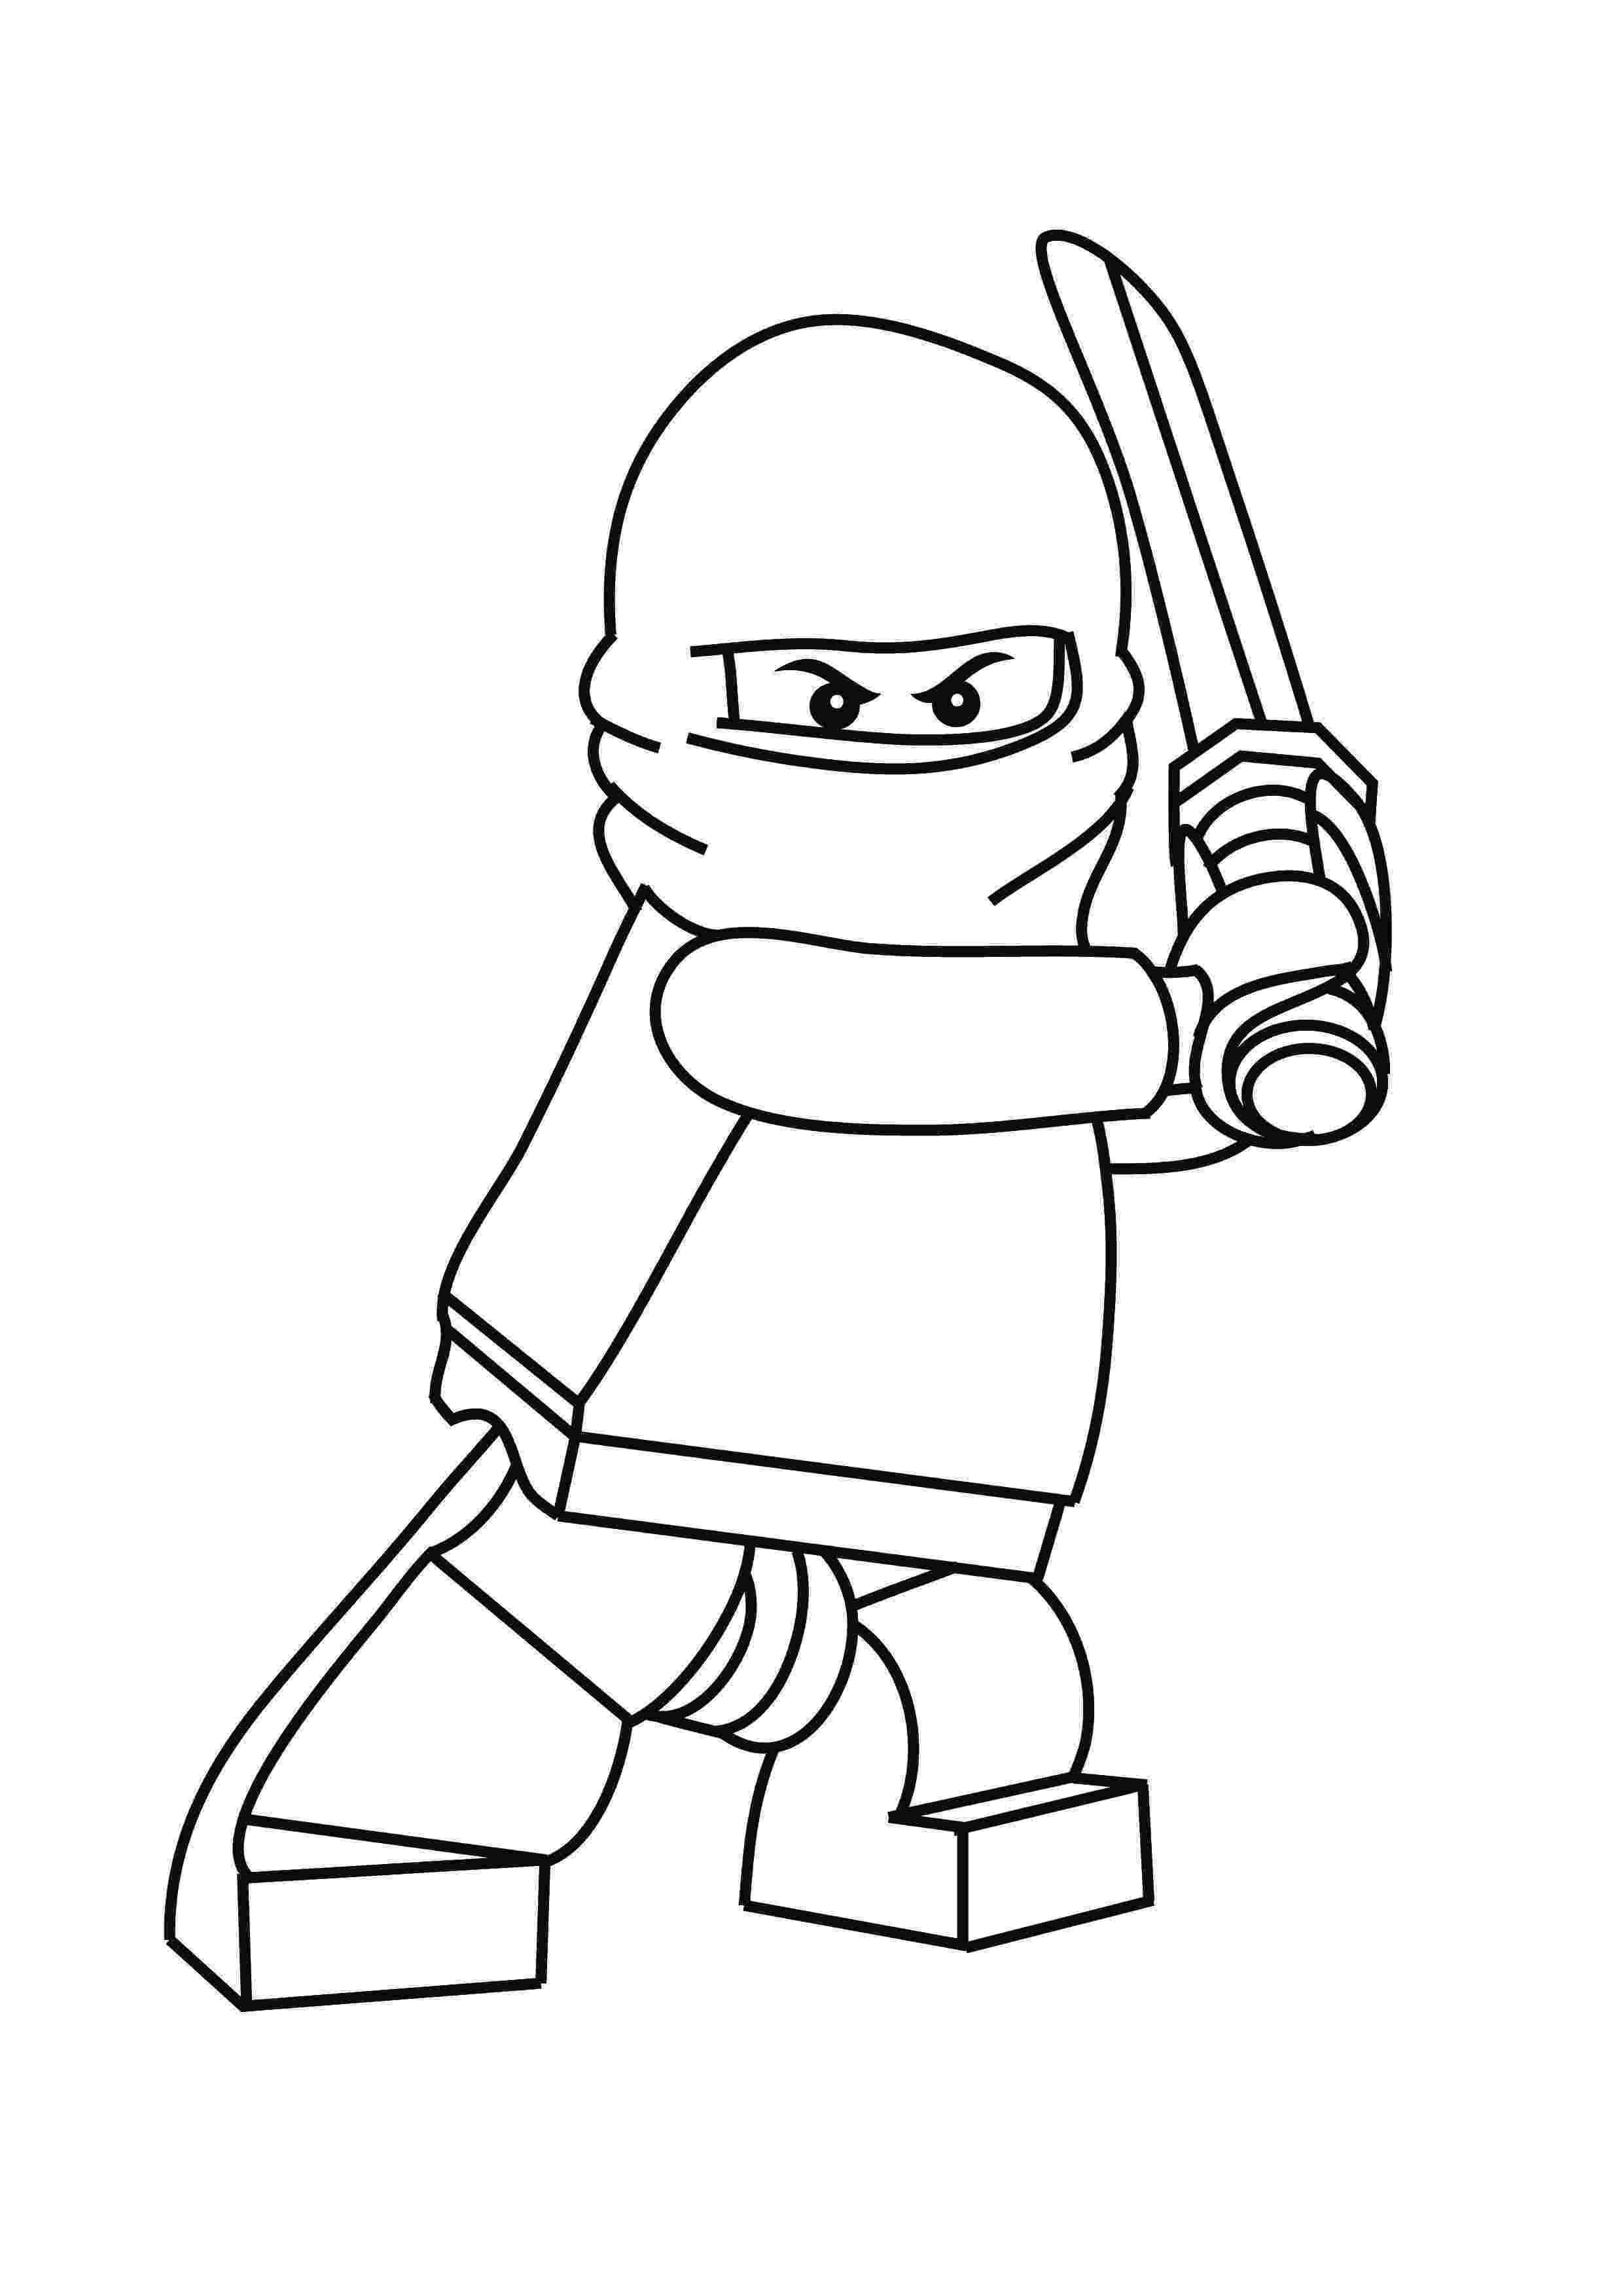 lego ninjago pictures lego ninjago coloring pages best coloring pages for kids lego ninjago pictures